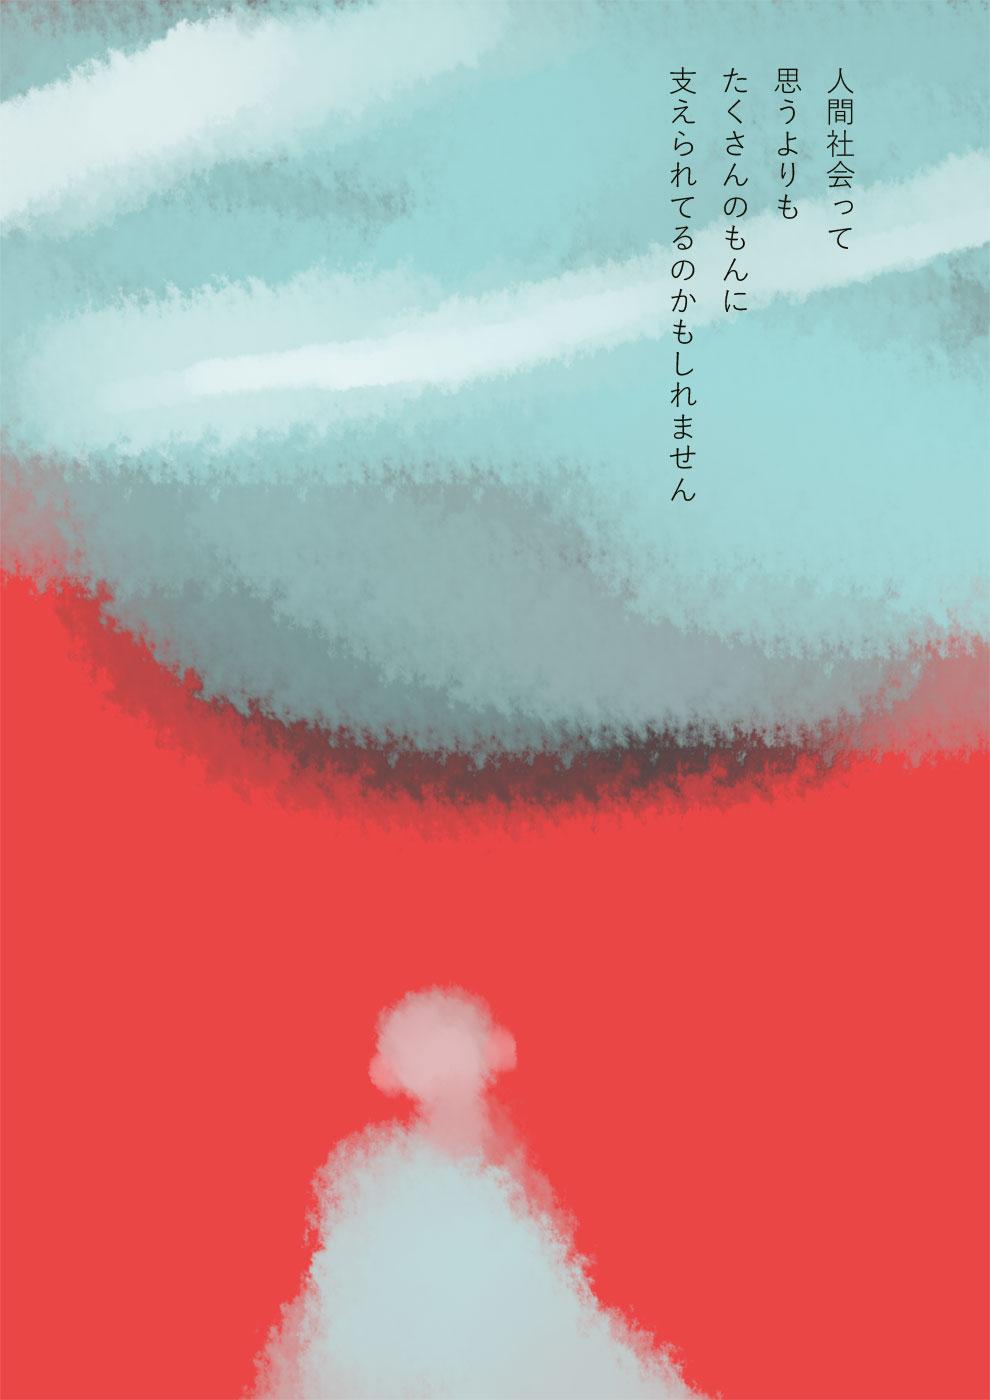 http://ahito.com/comic/ehon/kamiuta/img/2018/20180505_2/08.jpg